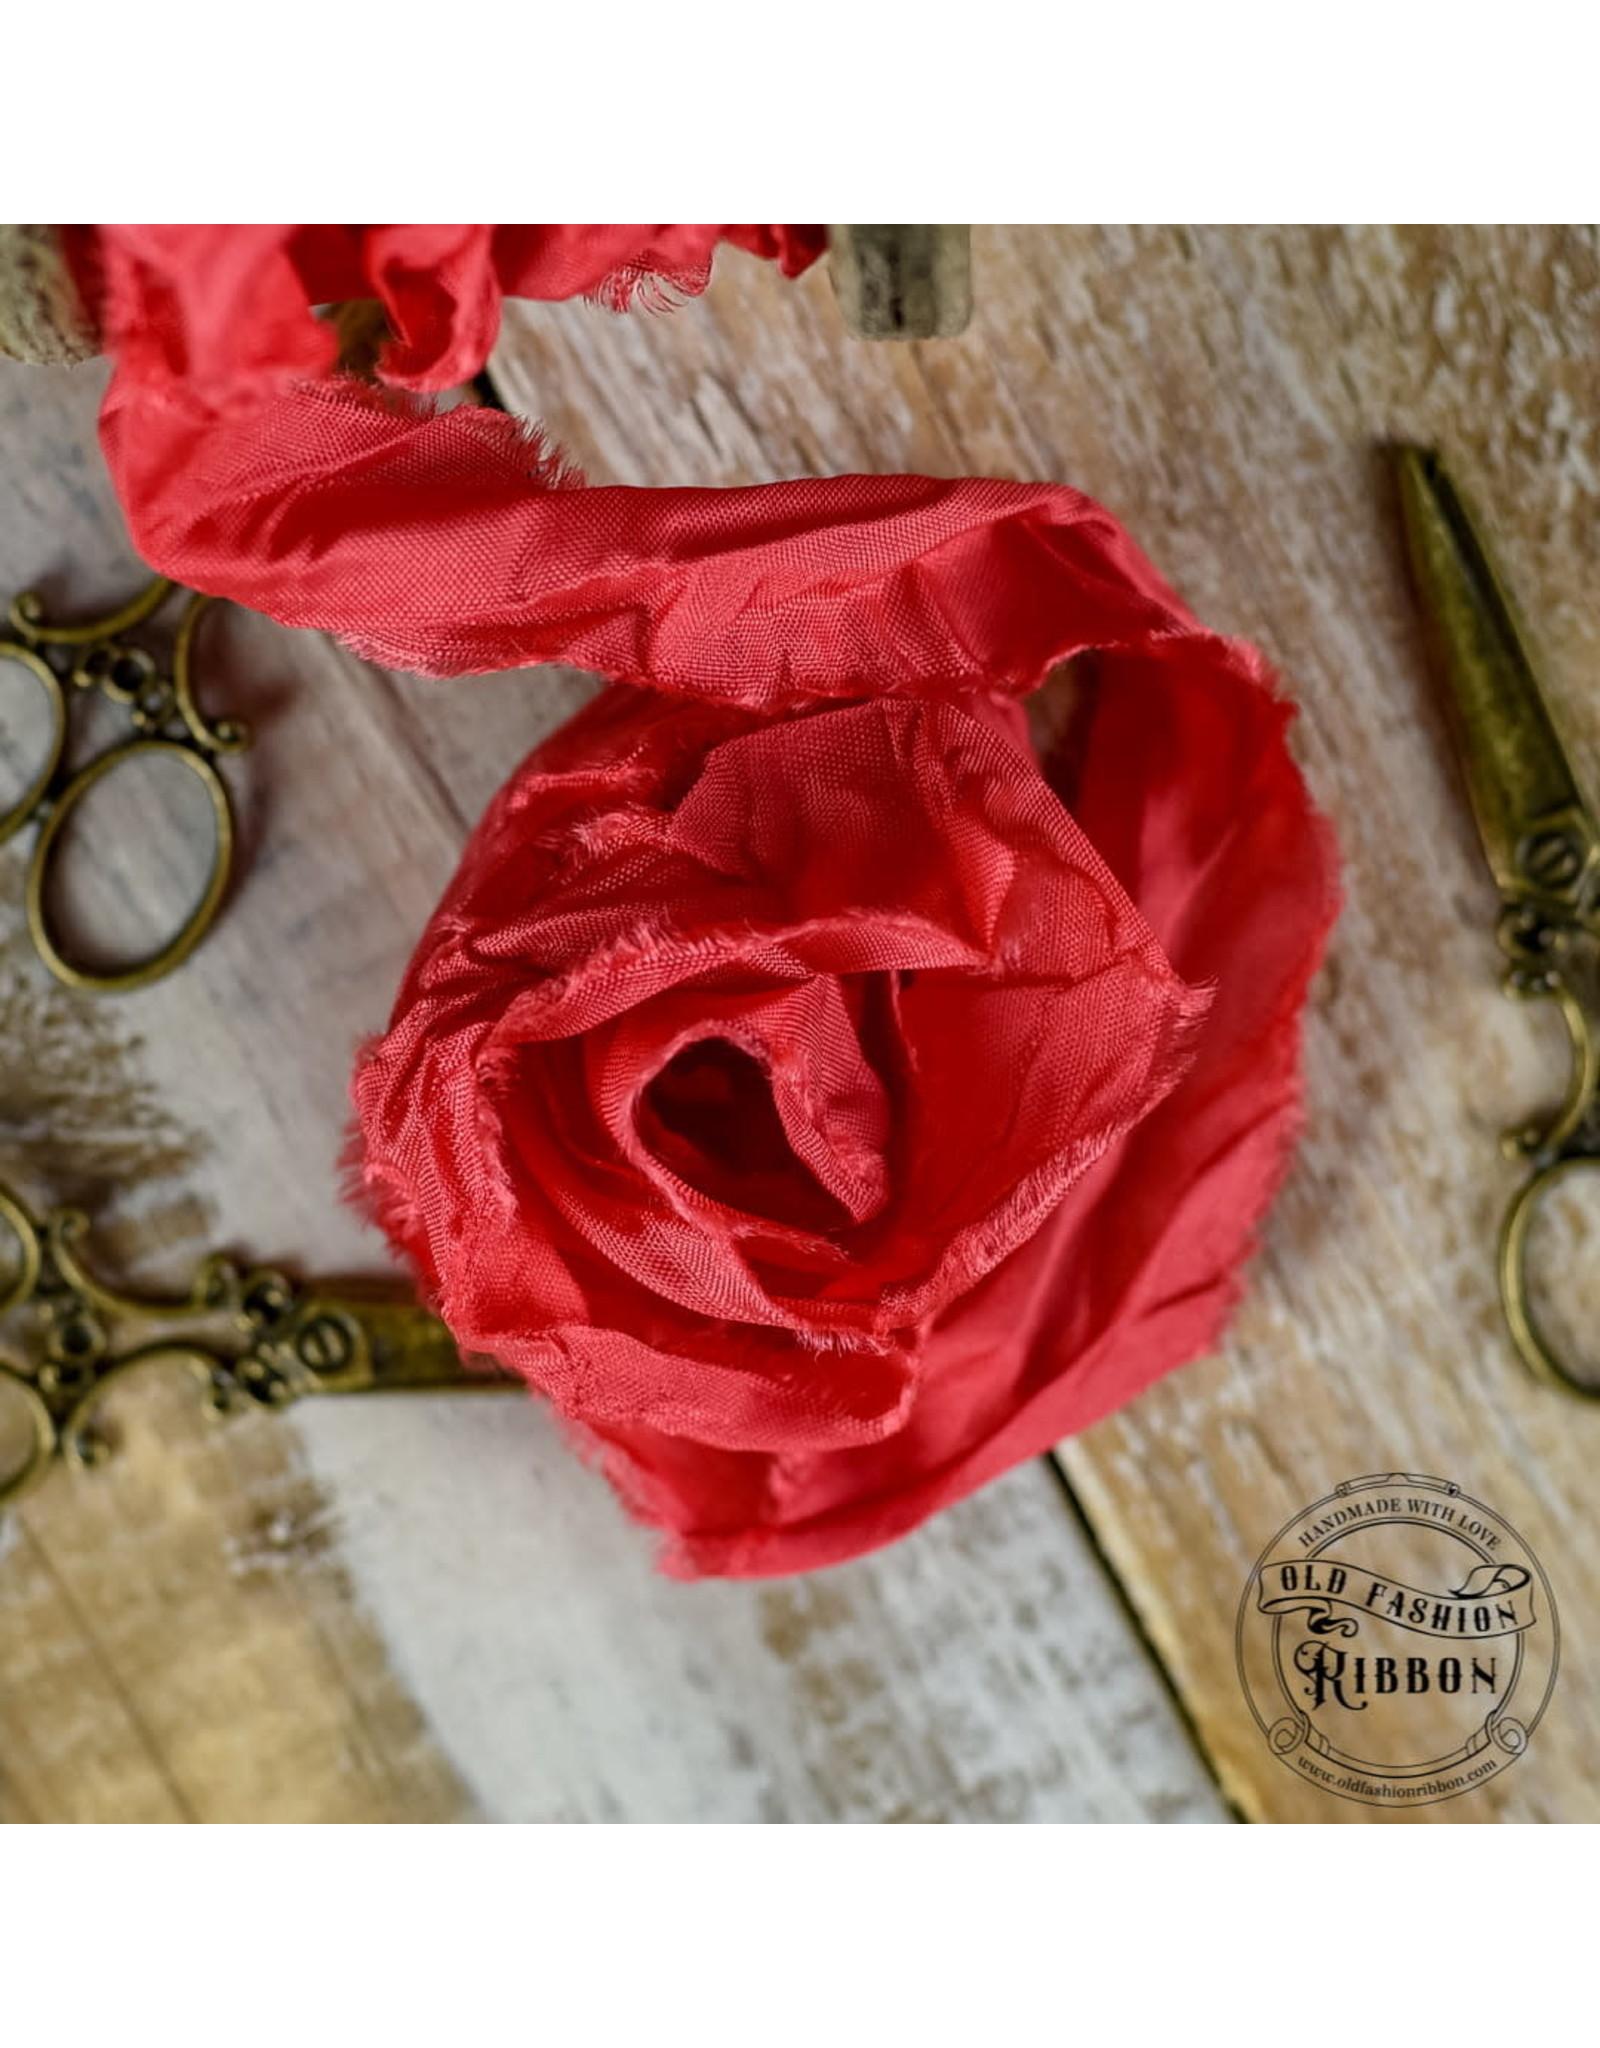 Old Fashion Ribbon Old Fashion Ribbon Satijn Raspberry OLDSB15